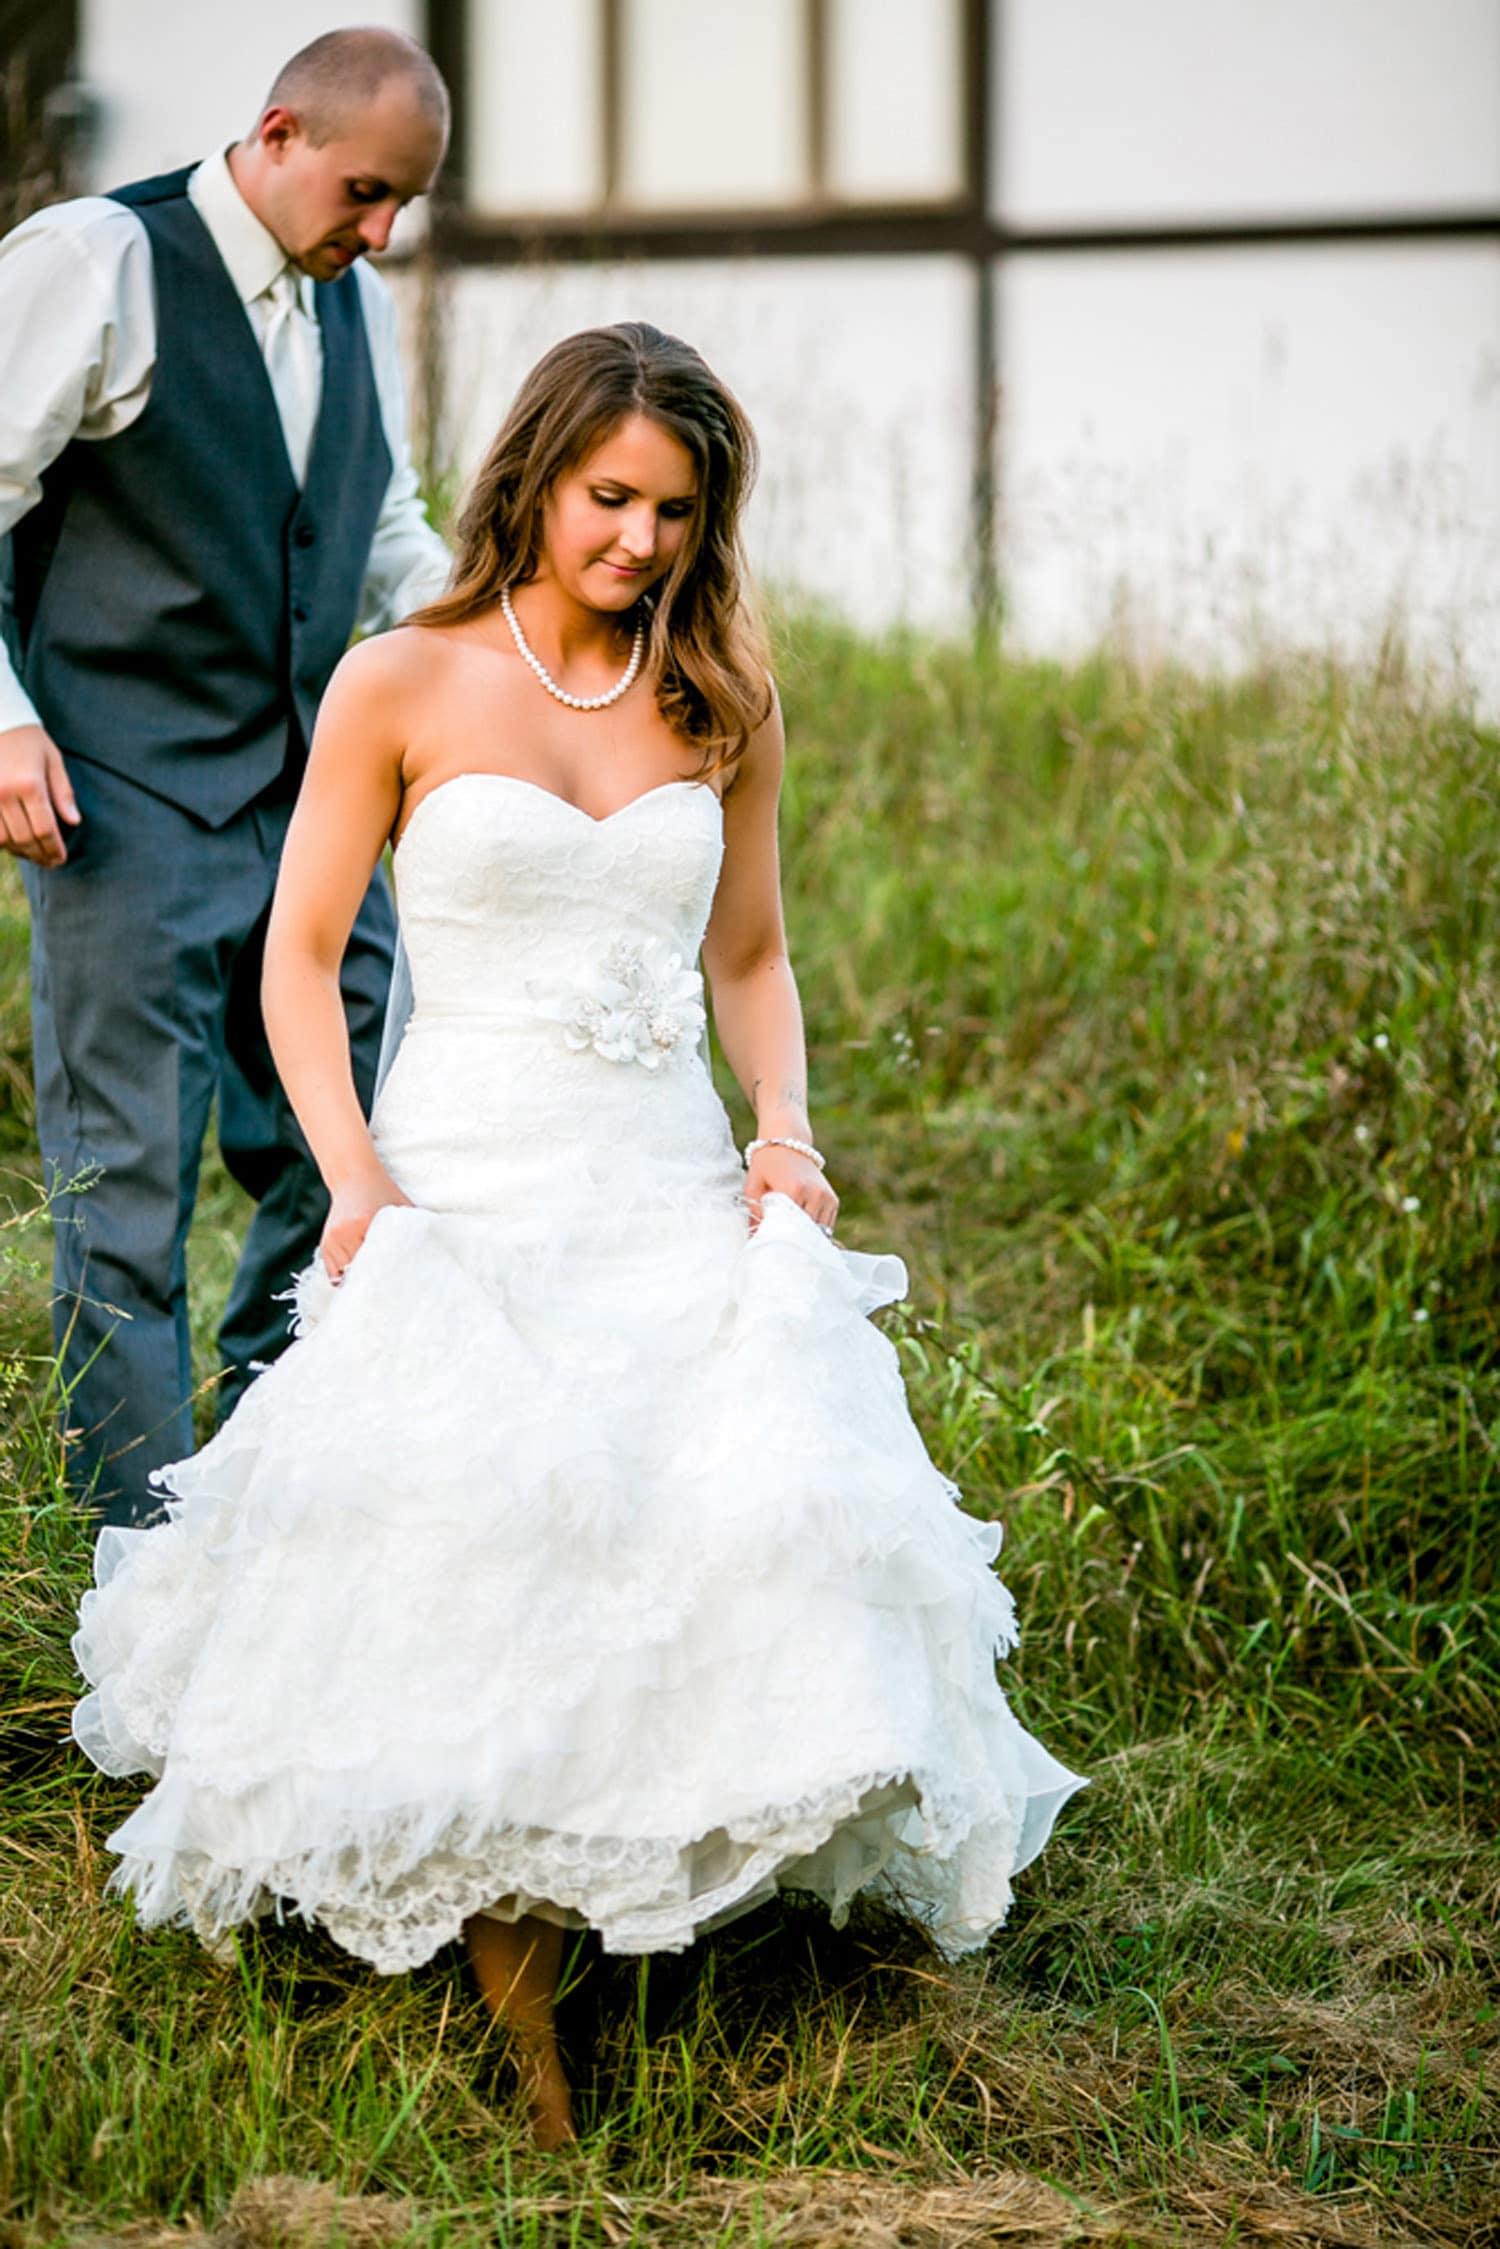 Cute couple wedding